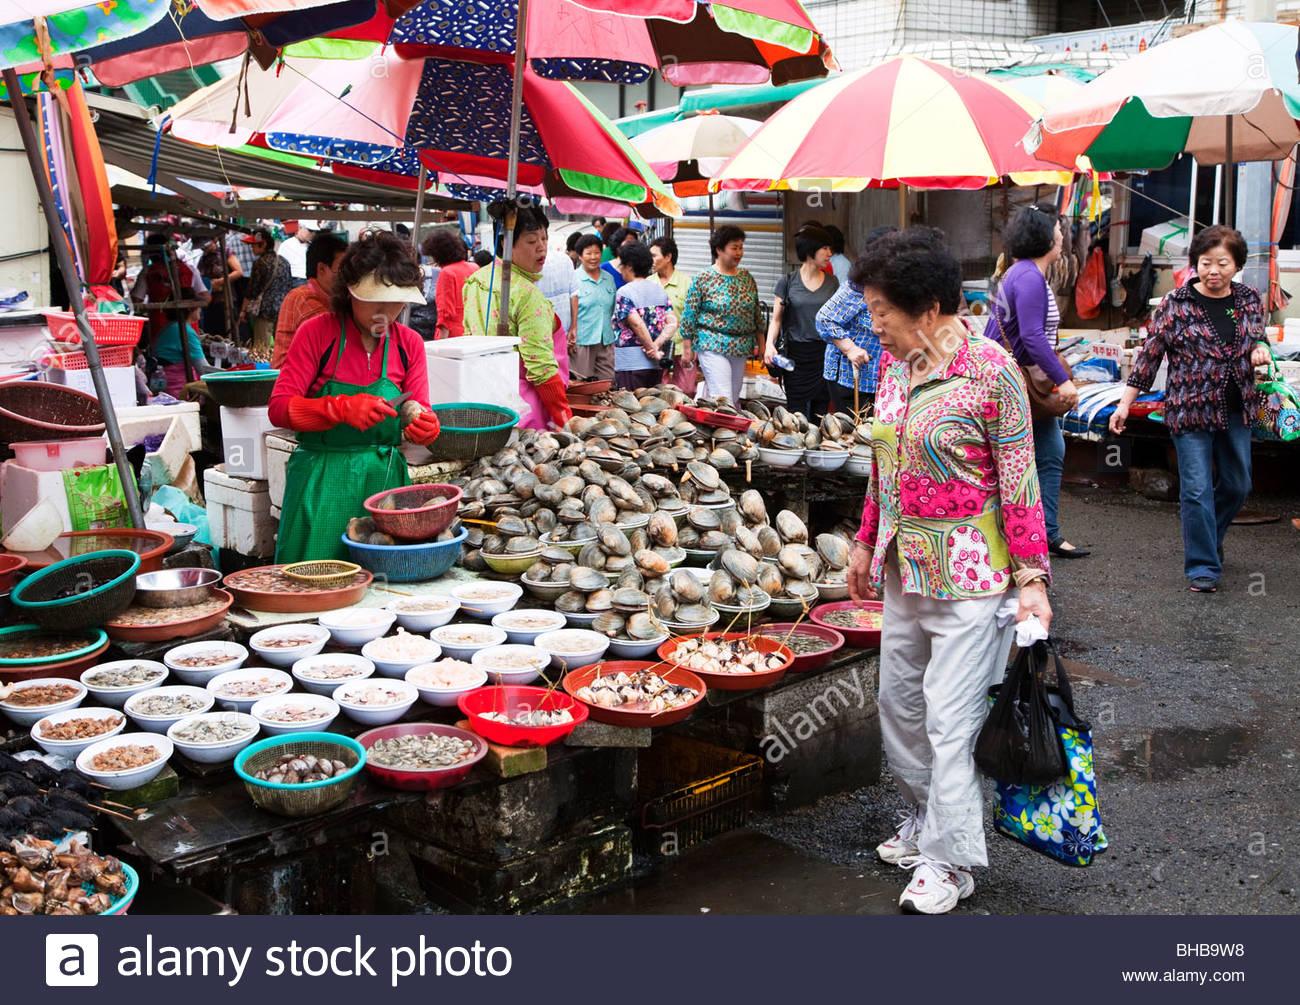 Asia Asian basket baskets Busan business buyer Cha gal chi fishmarket chagalchi; jagalshi customer display fish - Stock Image